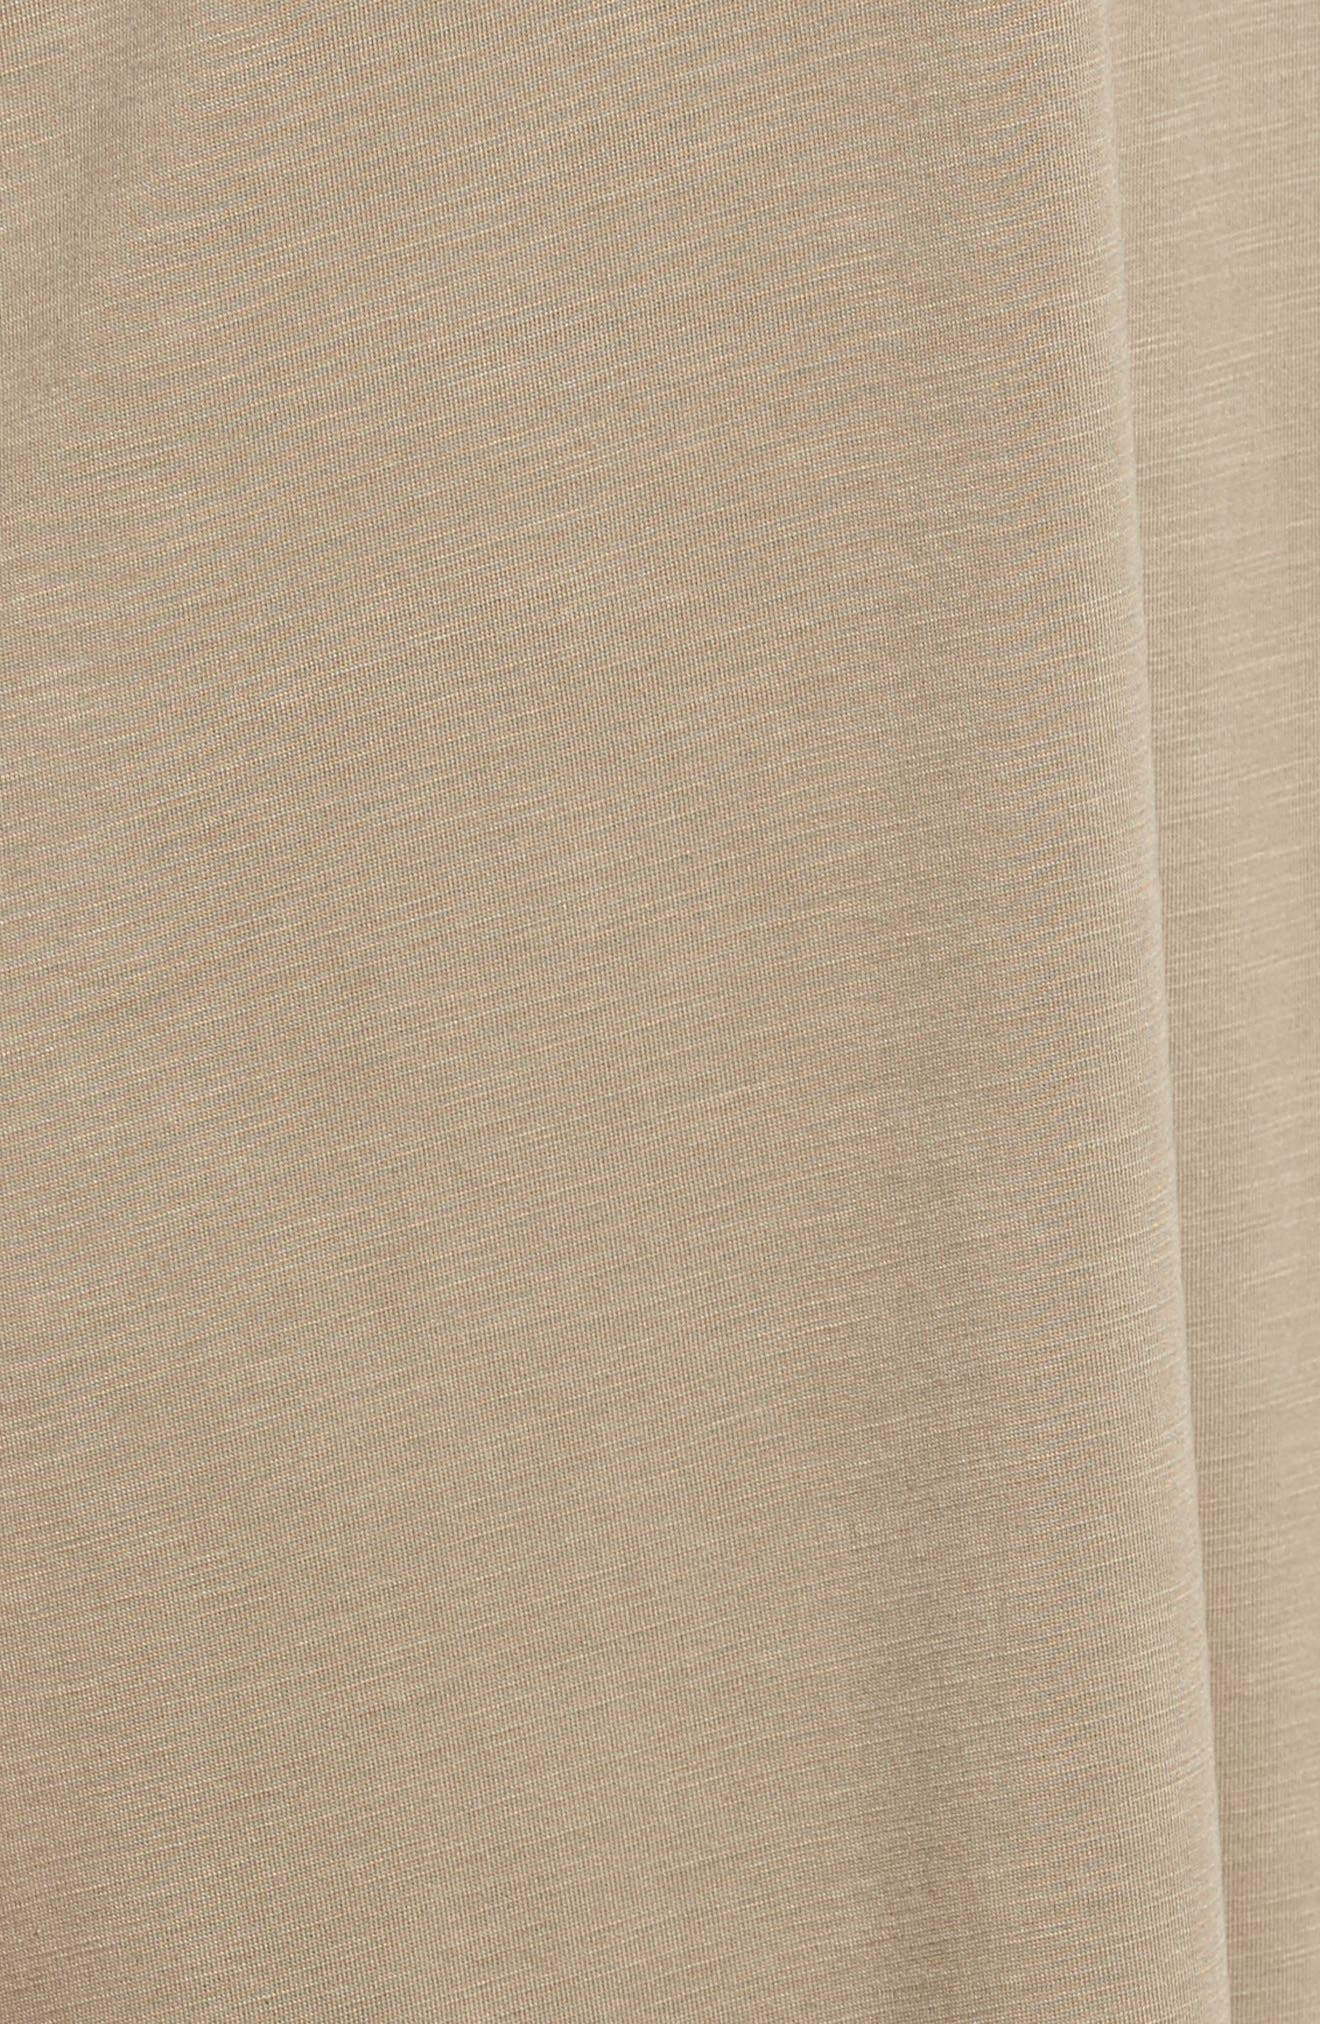 Boardwalk Convertible Jersey Dress,                             Alternate thumbnail 5, color,                             Washed Marshland